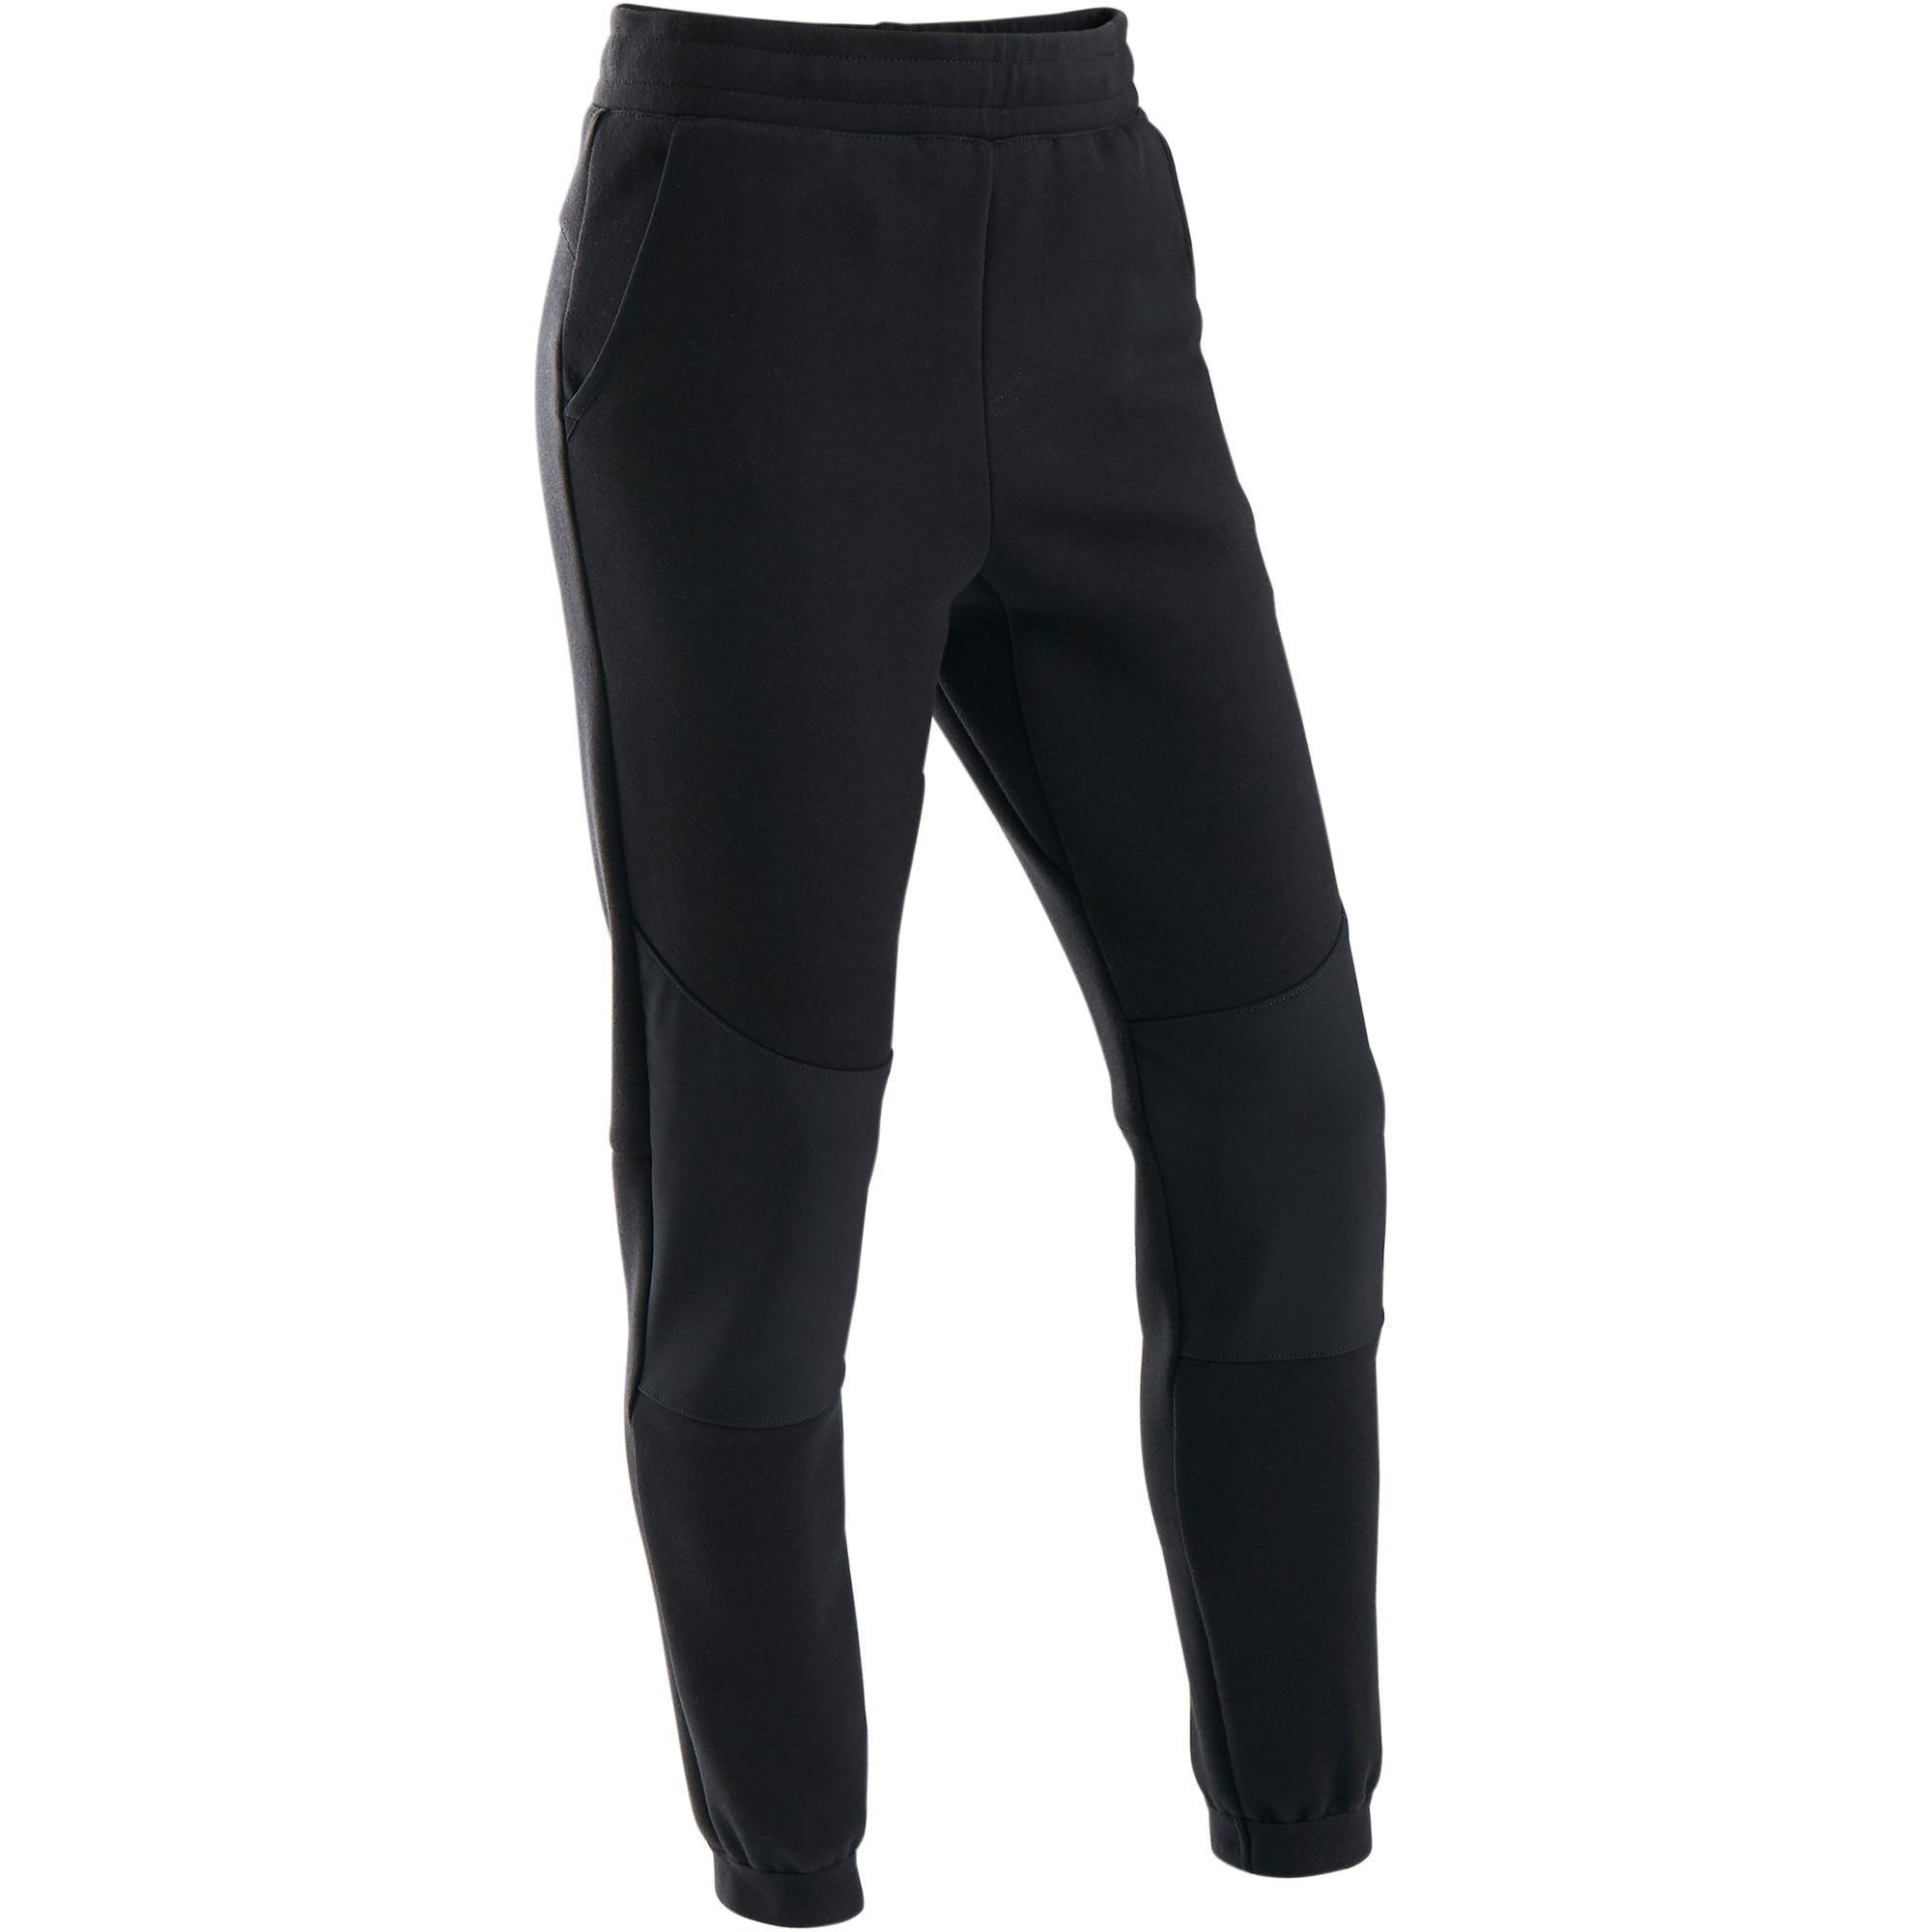 Jogginghose warm Slim Baumwolle atmungsaktiv robust 500 Gym Kinder schwarz